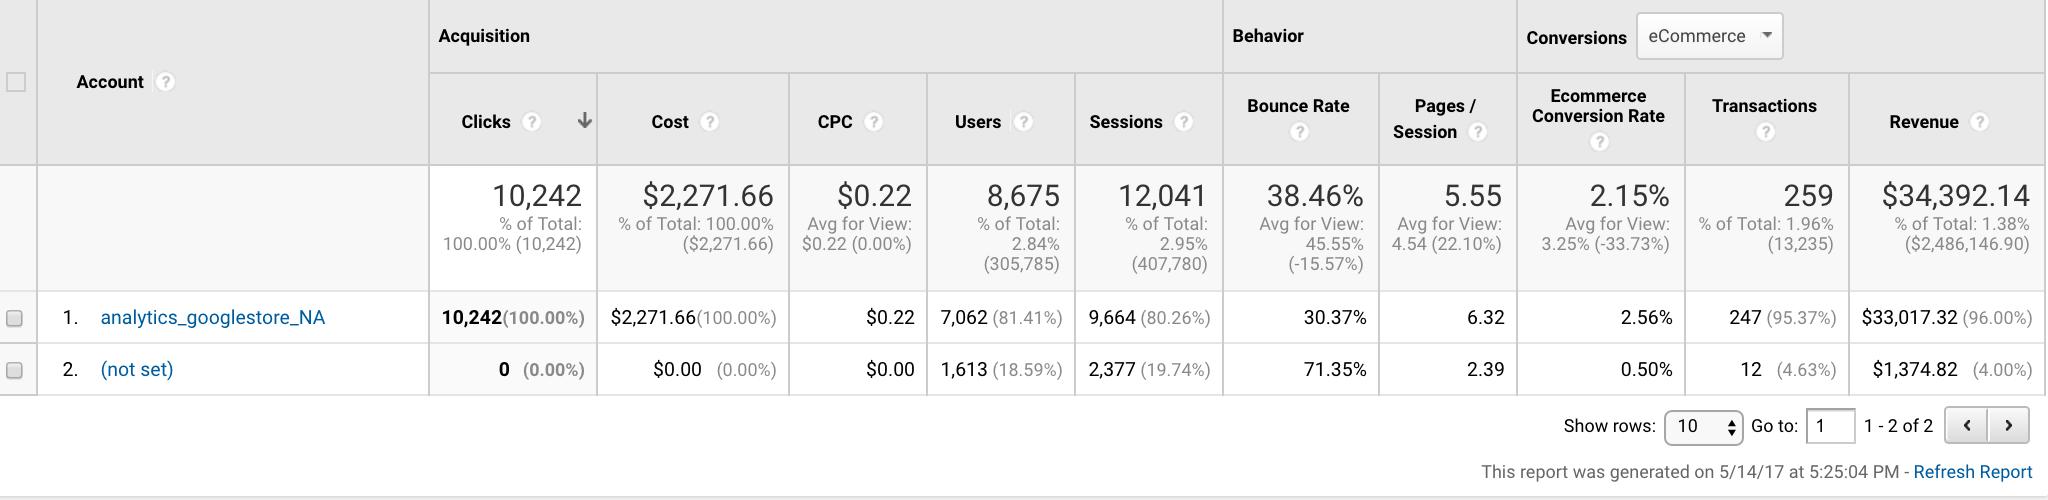 Cost per acquisition Google Analytics